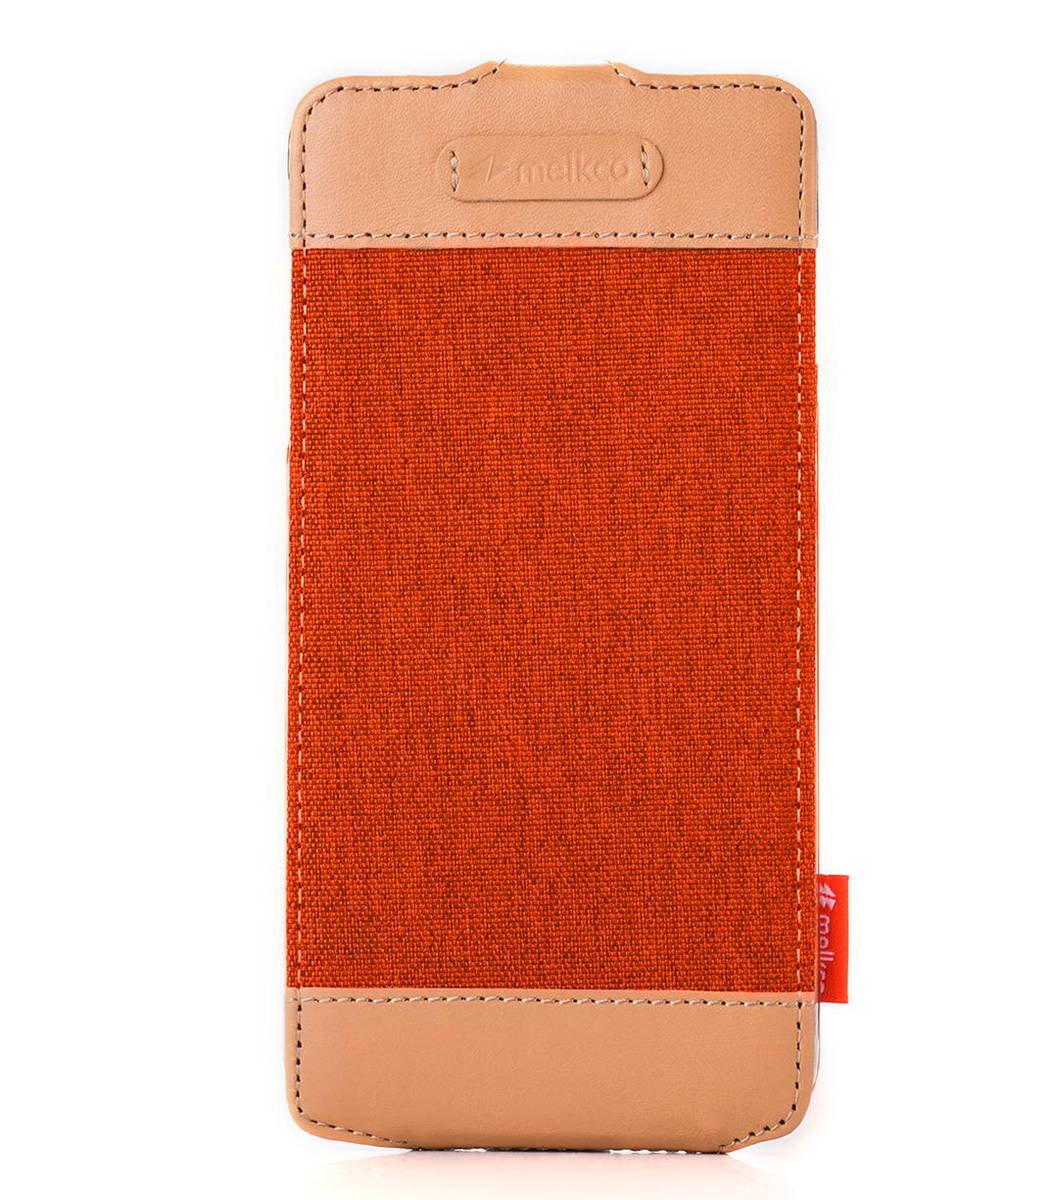 "Apple Iphone 6/6s (4.7"") Jacka Type Cru系列高級時尚真皮手機套(橙色)"